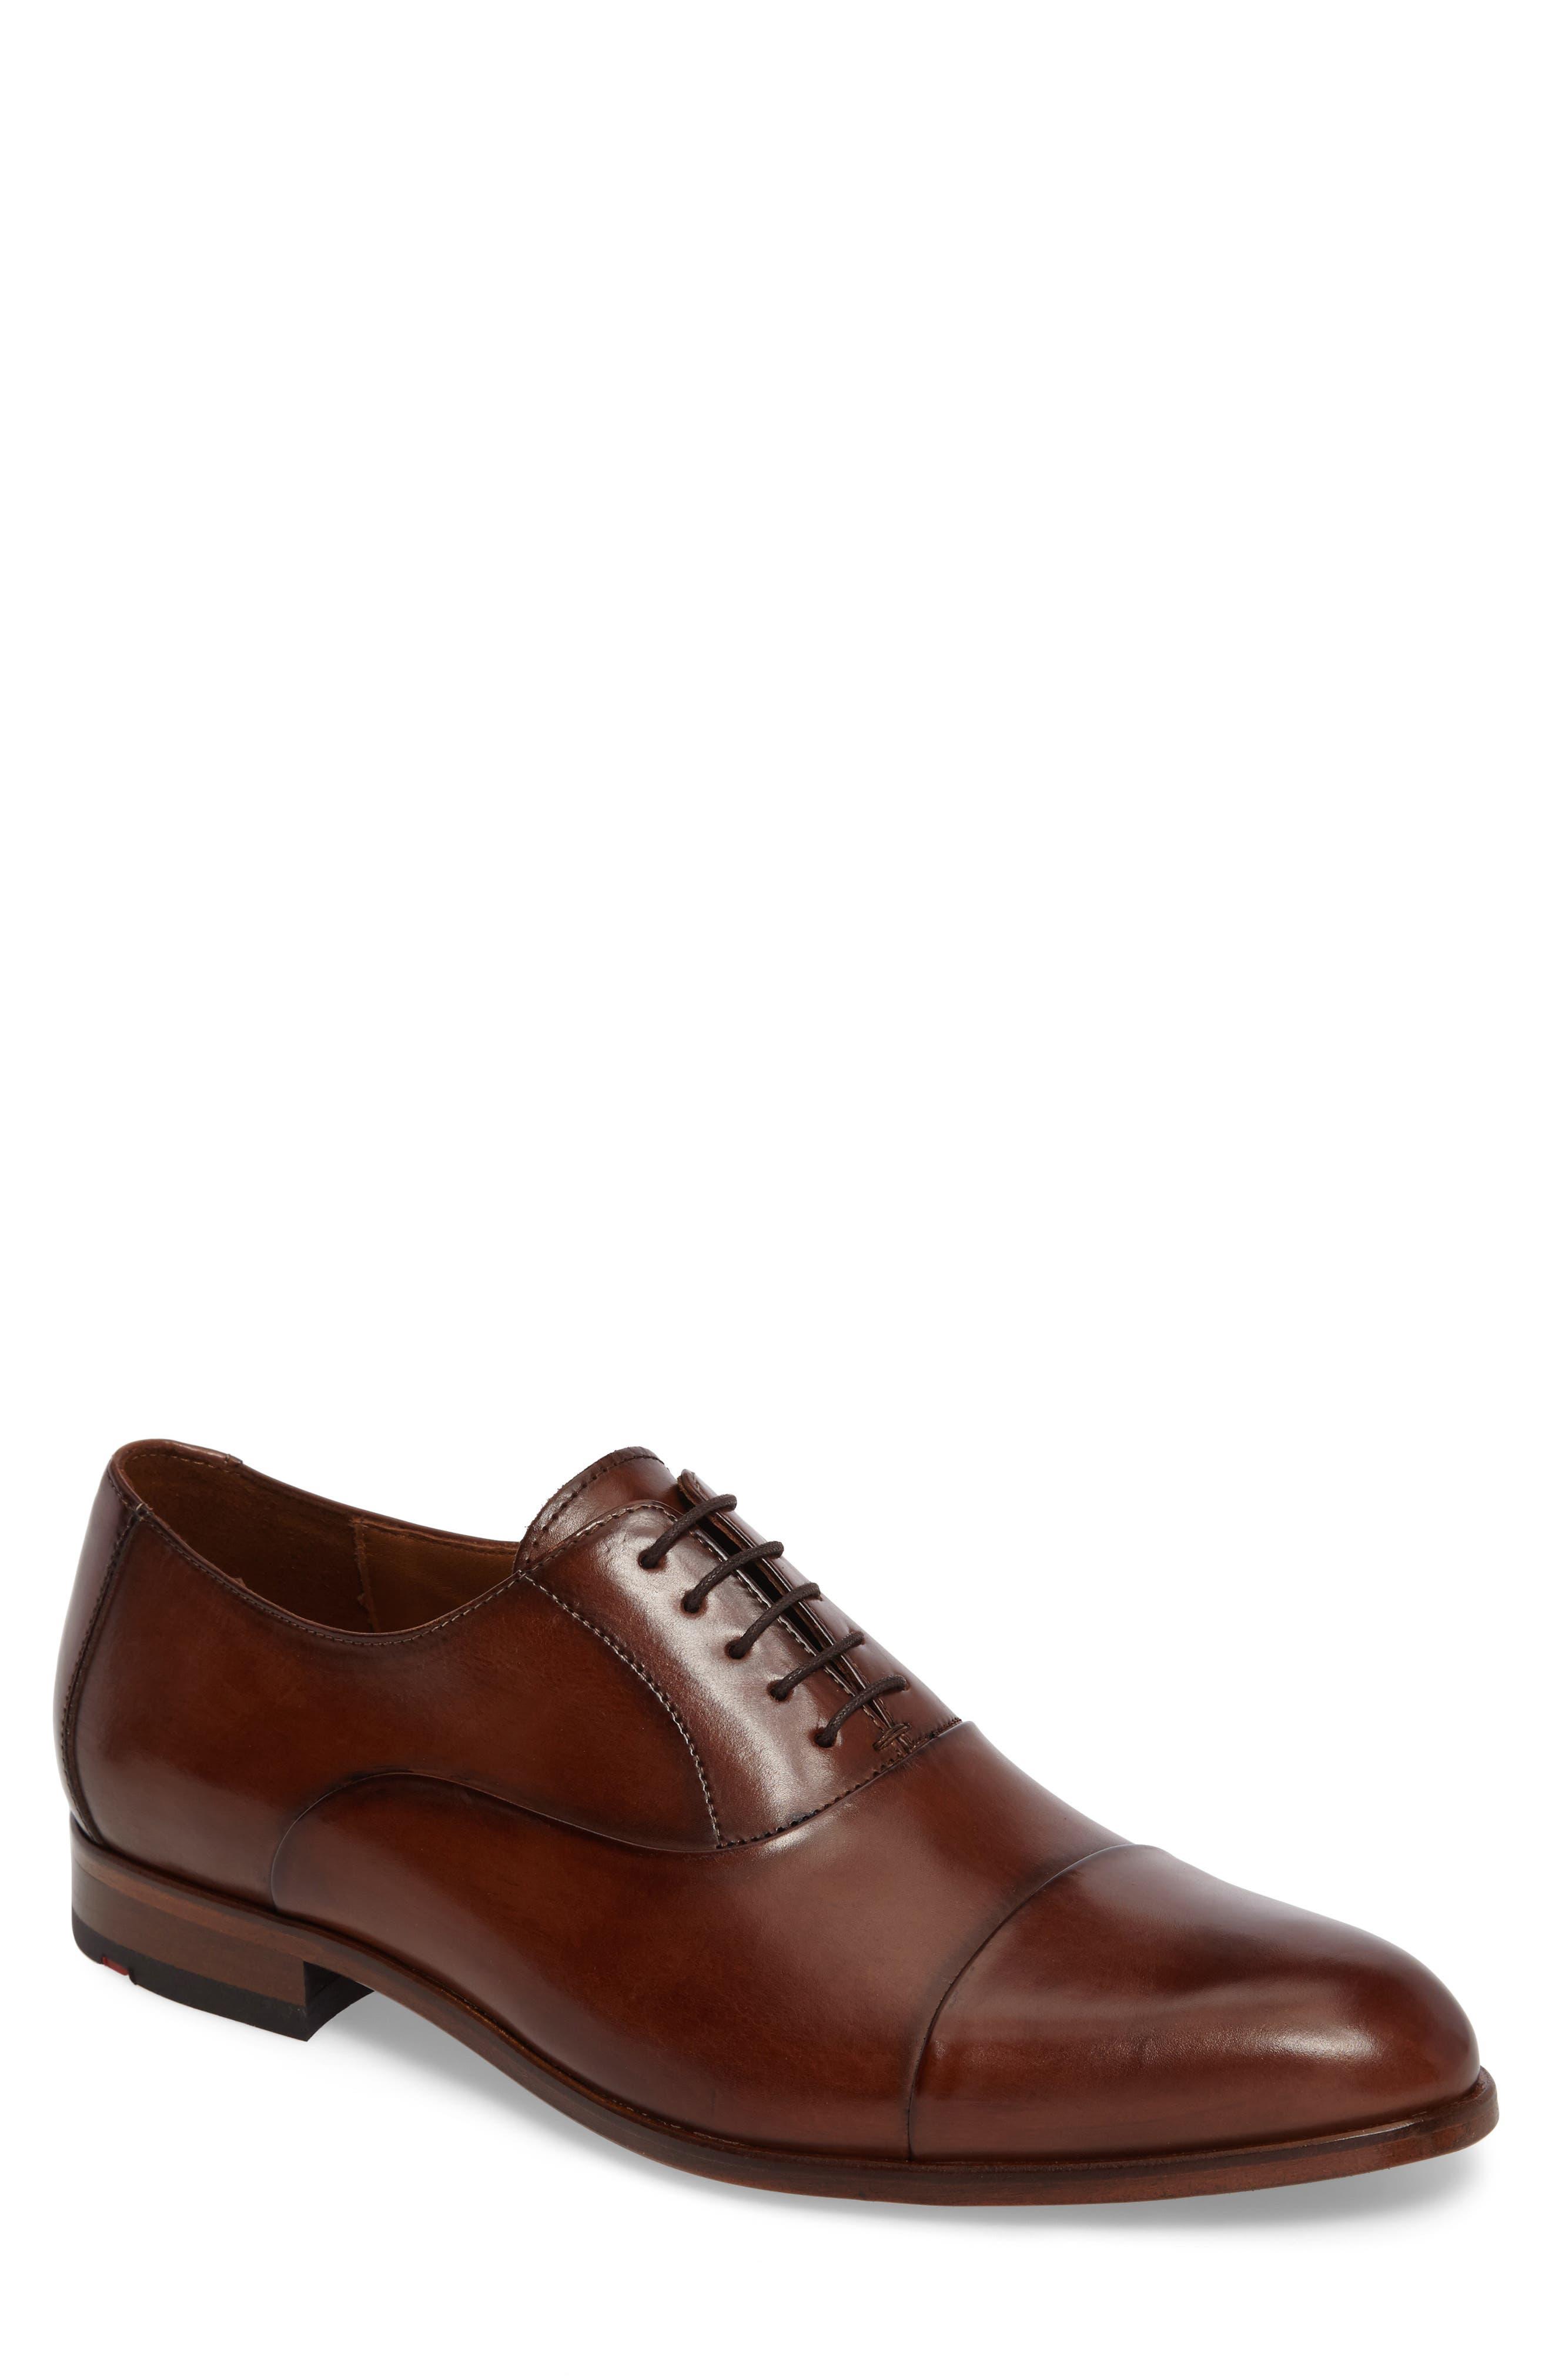 Malik Cap-Toe Oxford,                         Main,                         color, Brown Leather